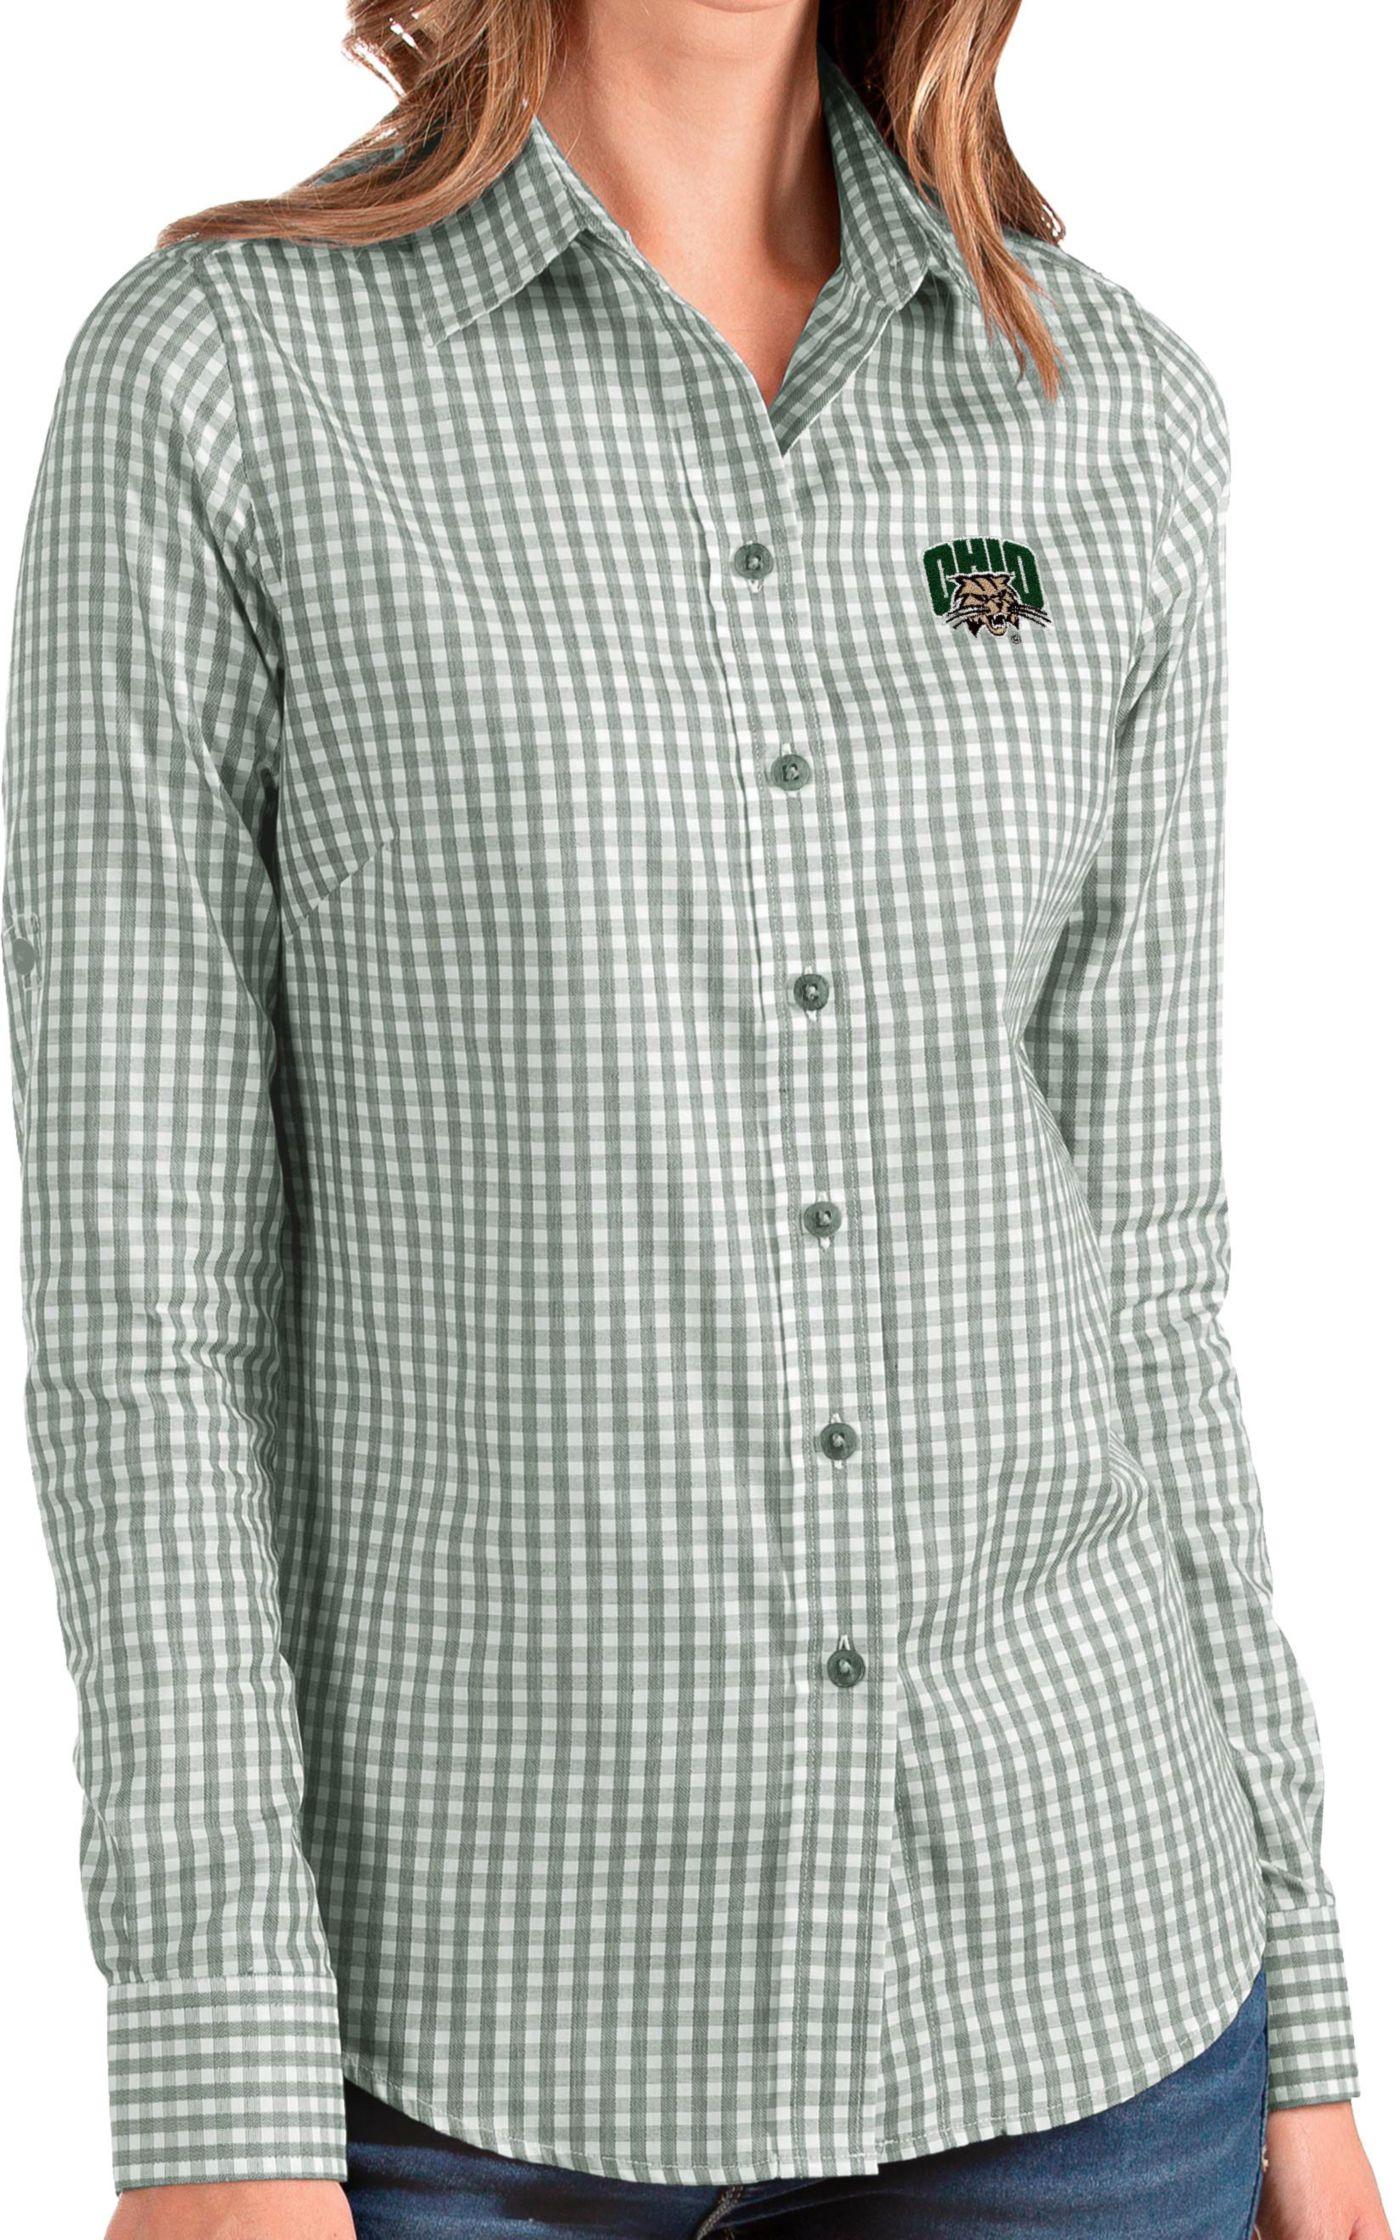 Antigua Women's Ohio Bobcats Green Structure Button Down Long Sleeve Shirt